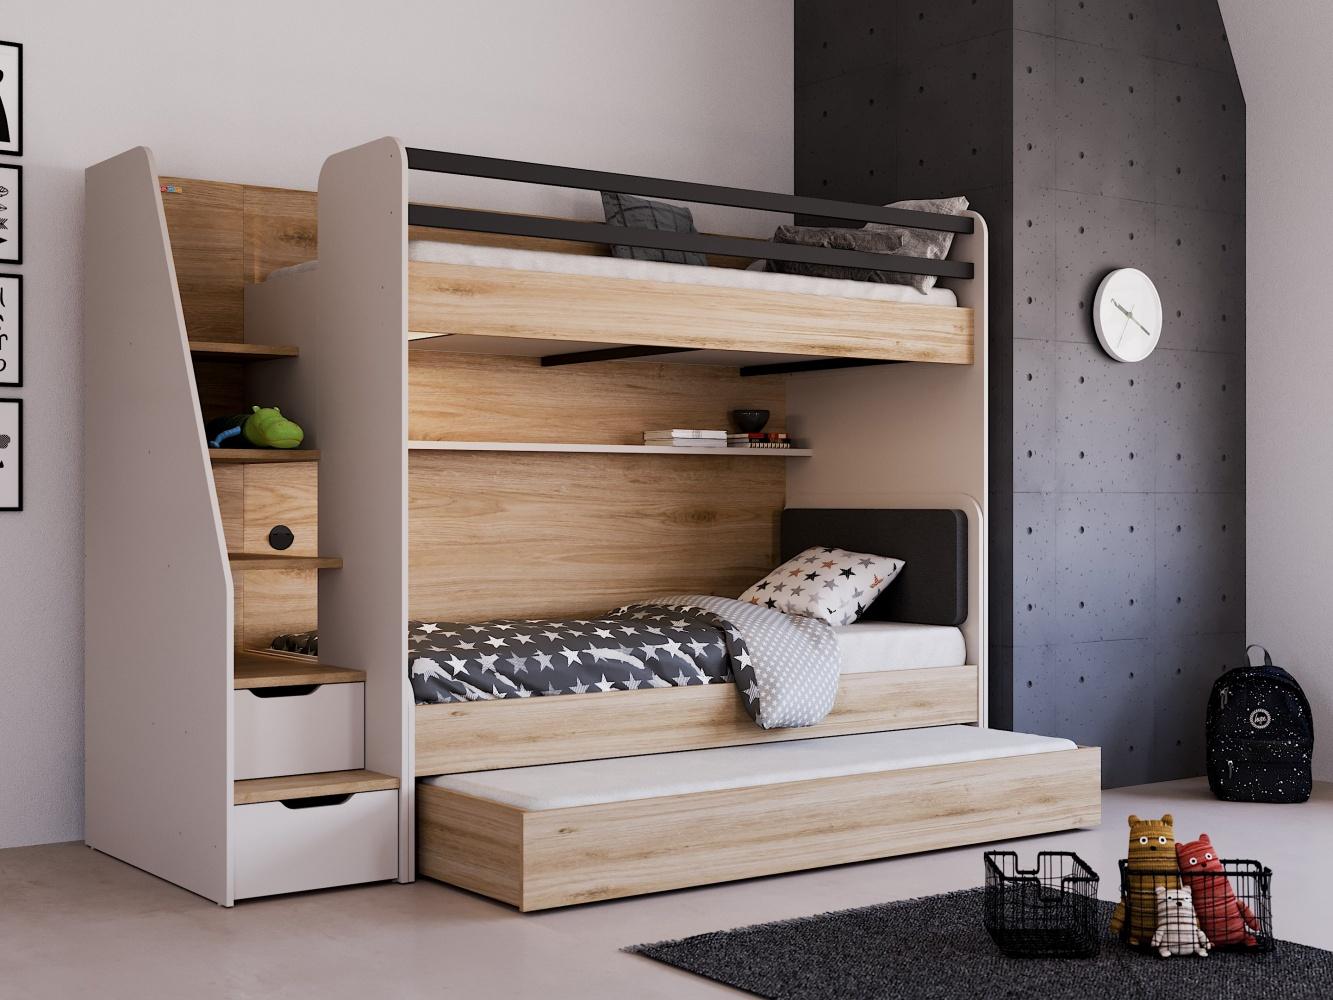 Almila Kinderzimmer Set  Novum Options  mit 3 Schlafplätzen